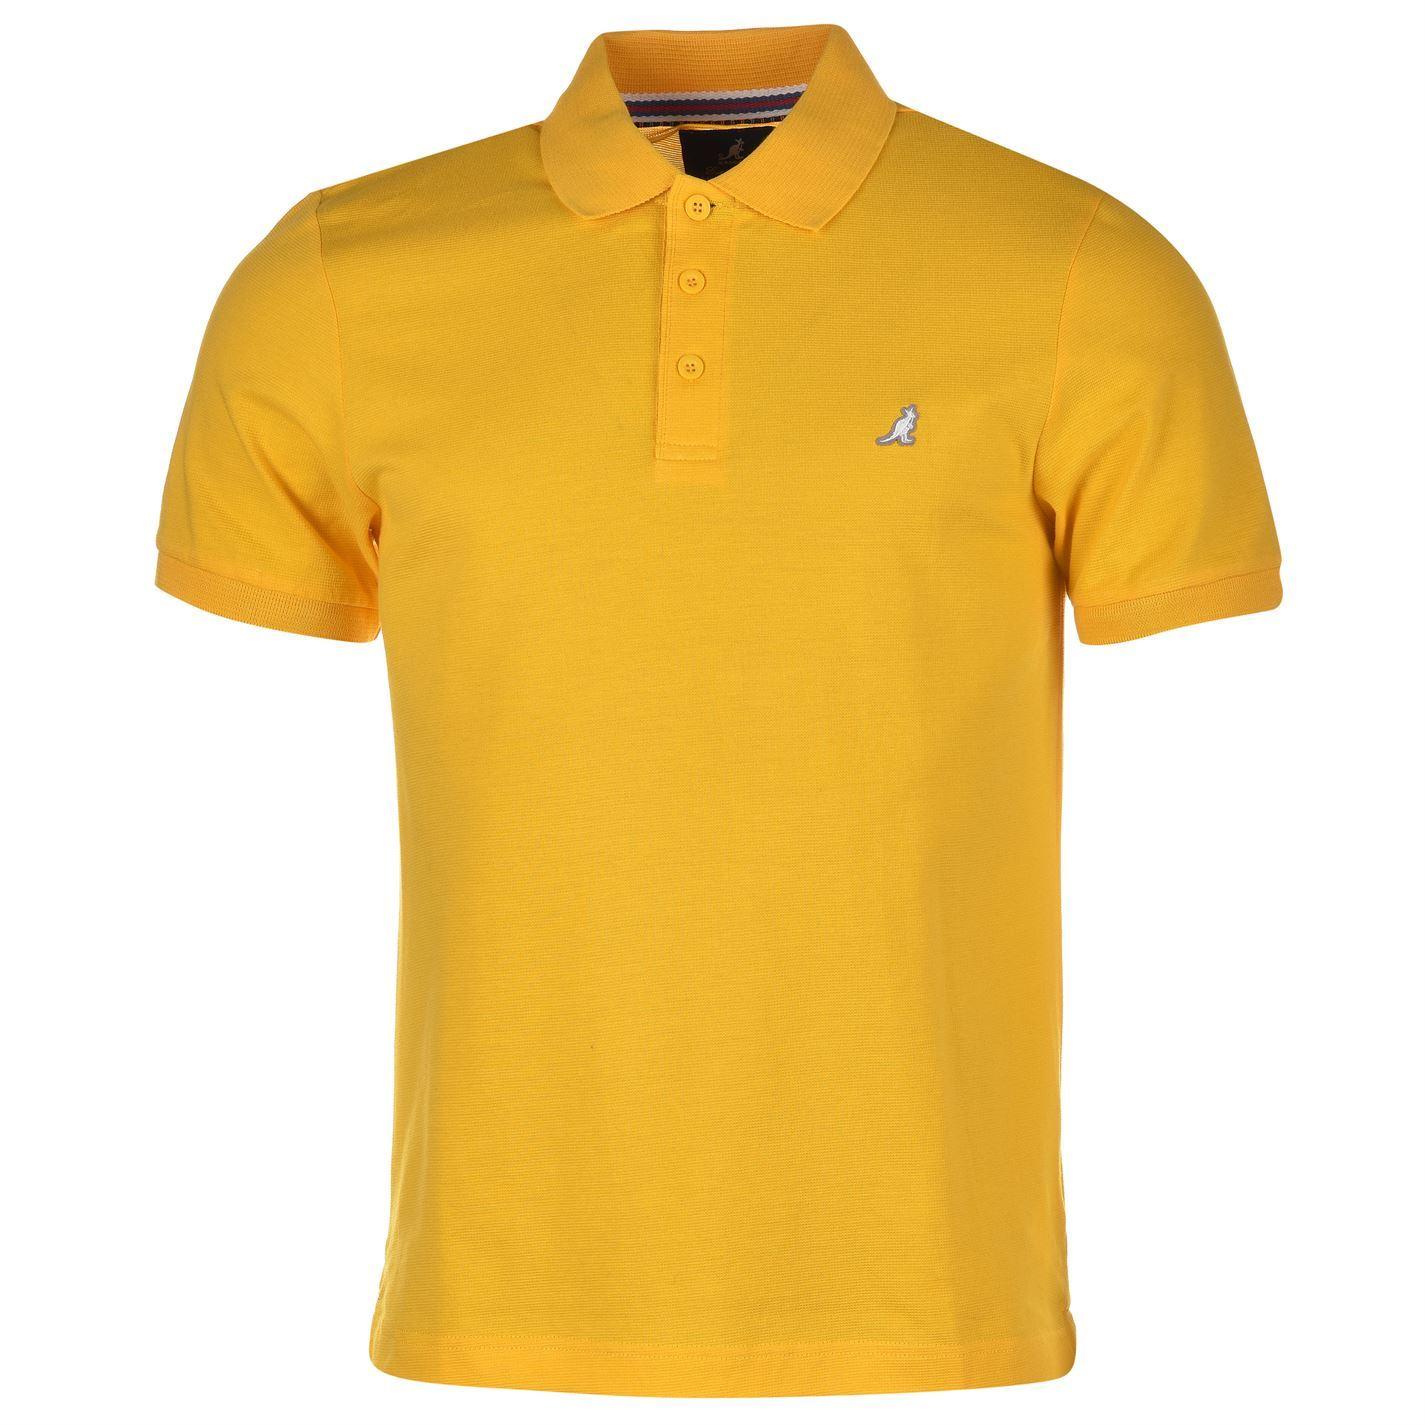 Kangol mens brit fit polo t shirt tee top short sleeve for Best fitting men s dress shirts